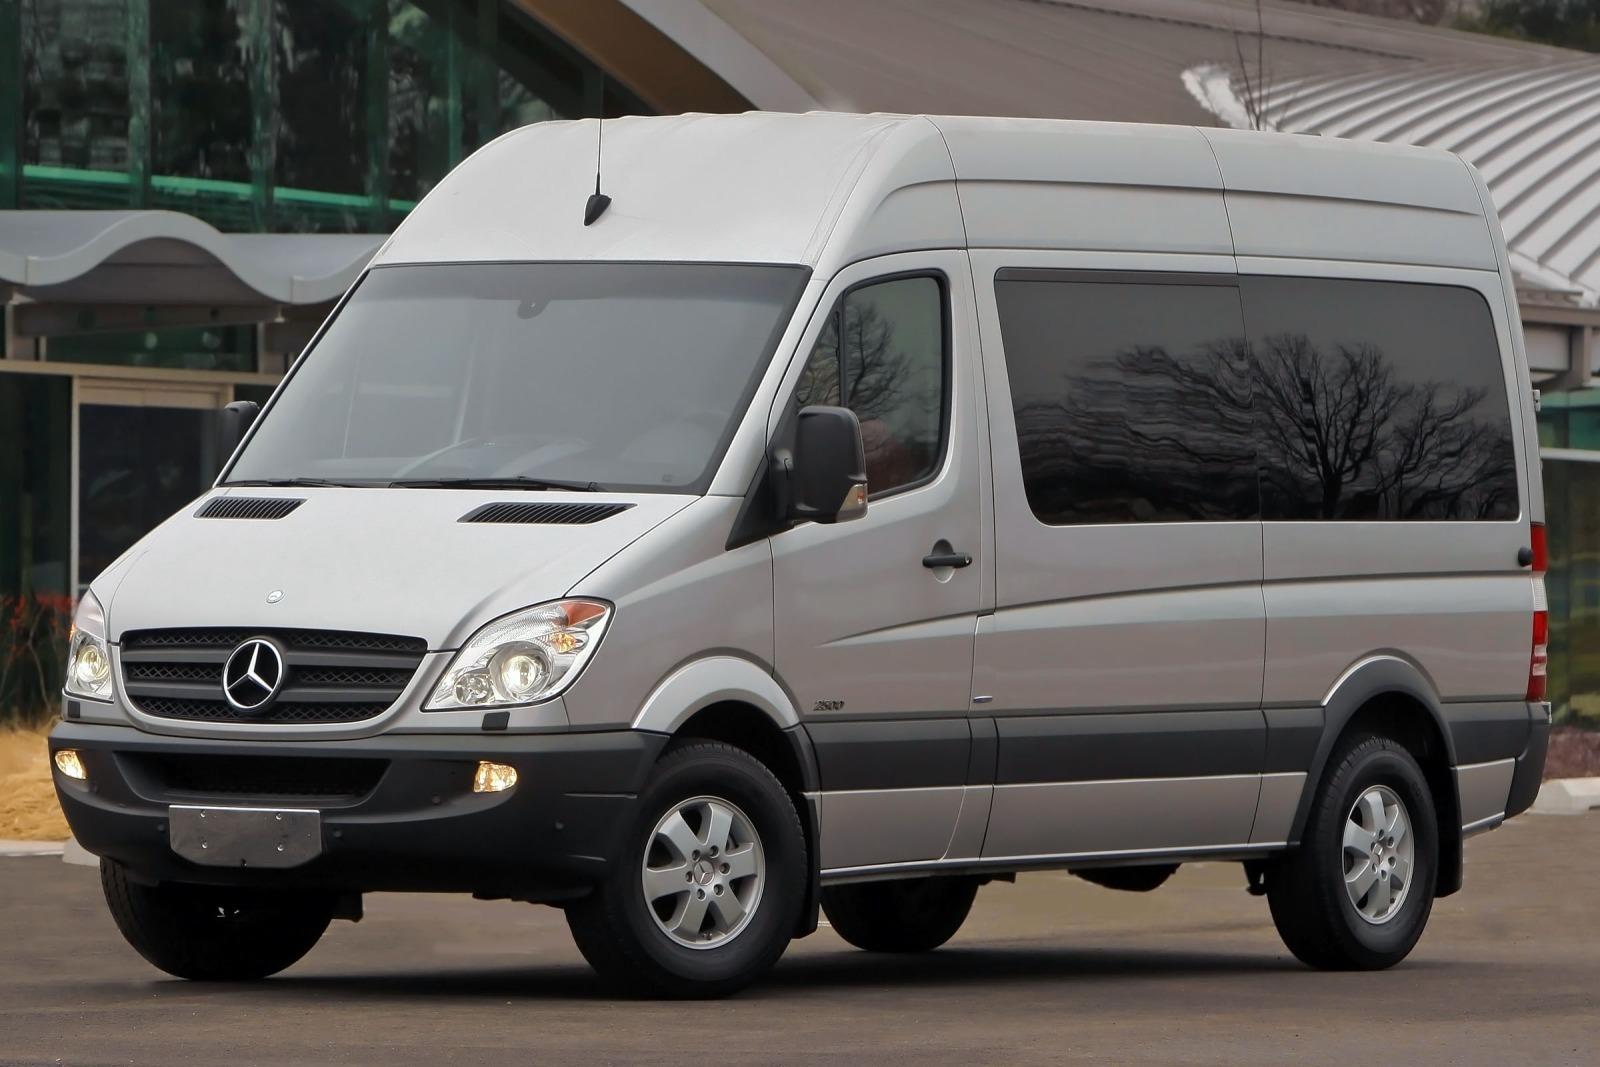 2012 Mercedes Benz Sprinter Image 7